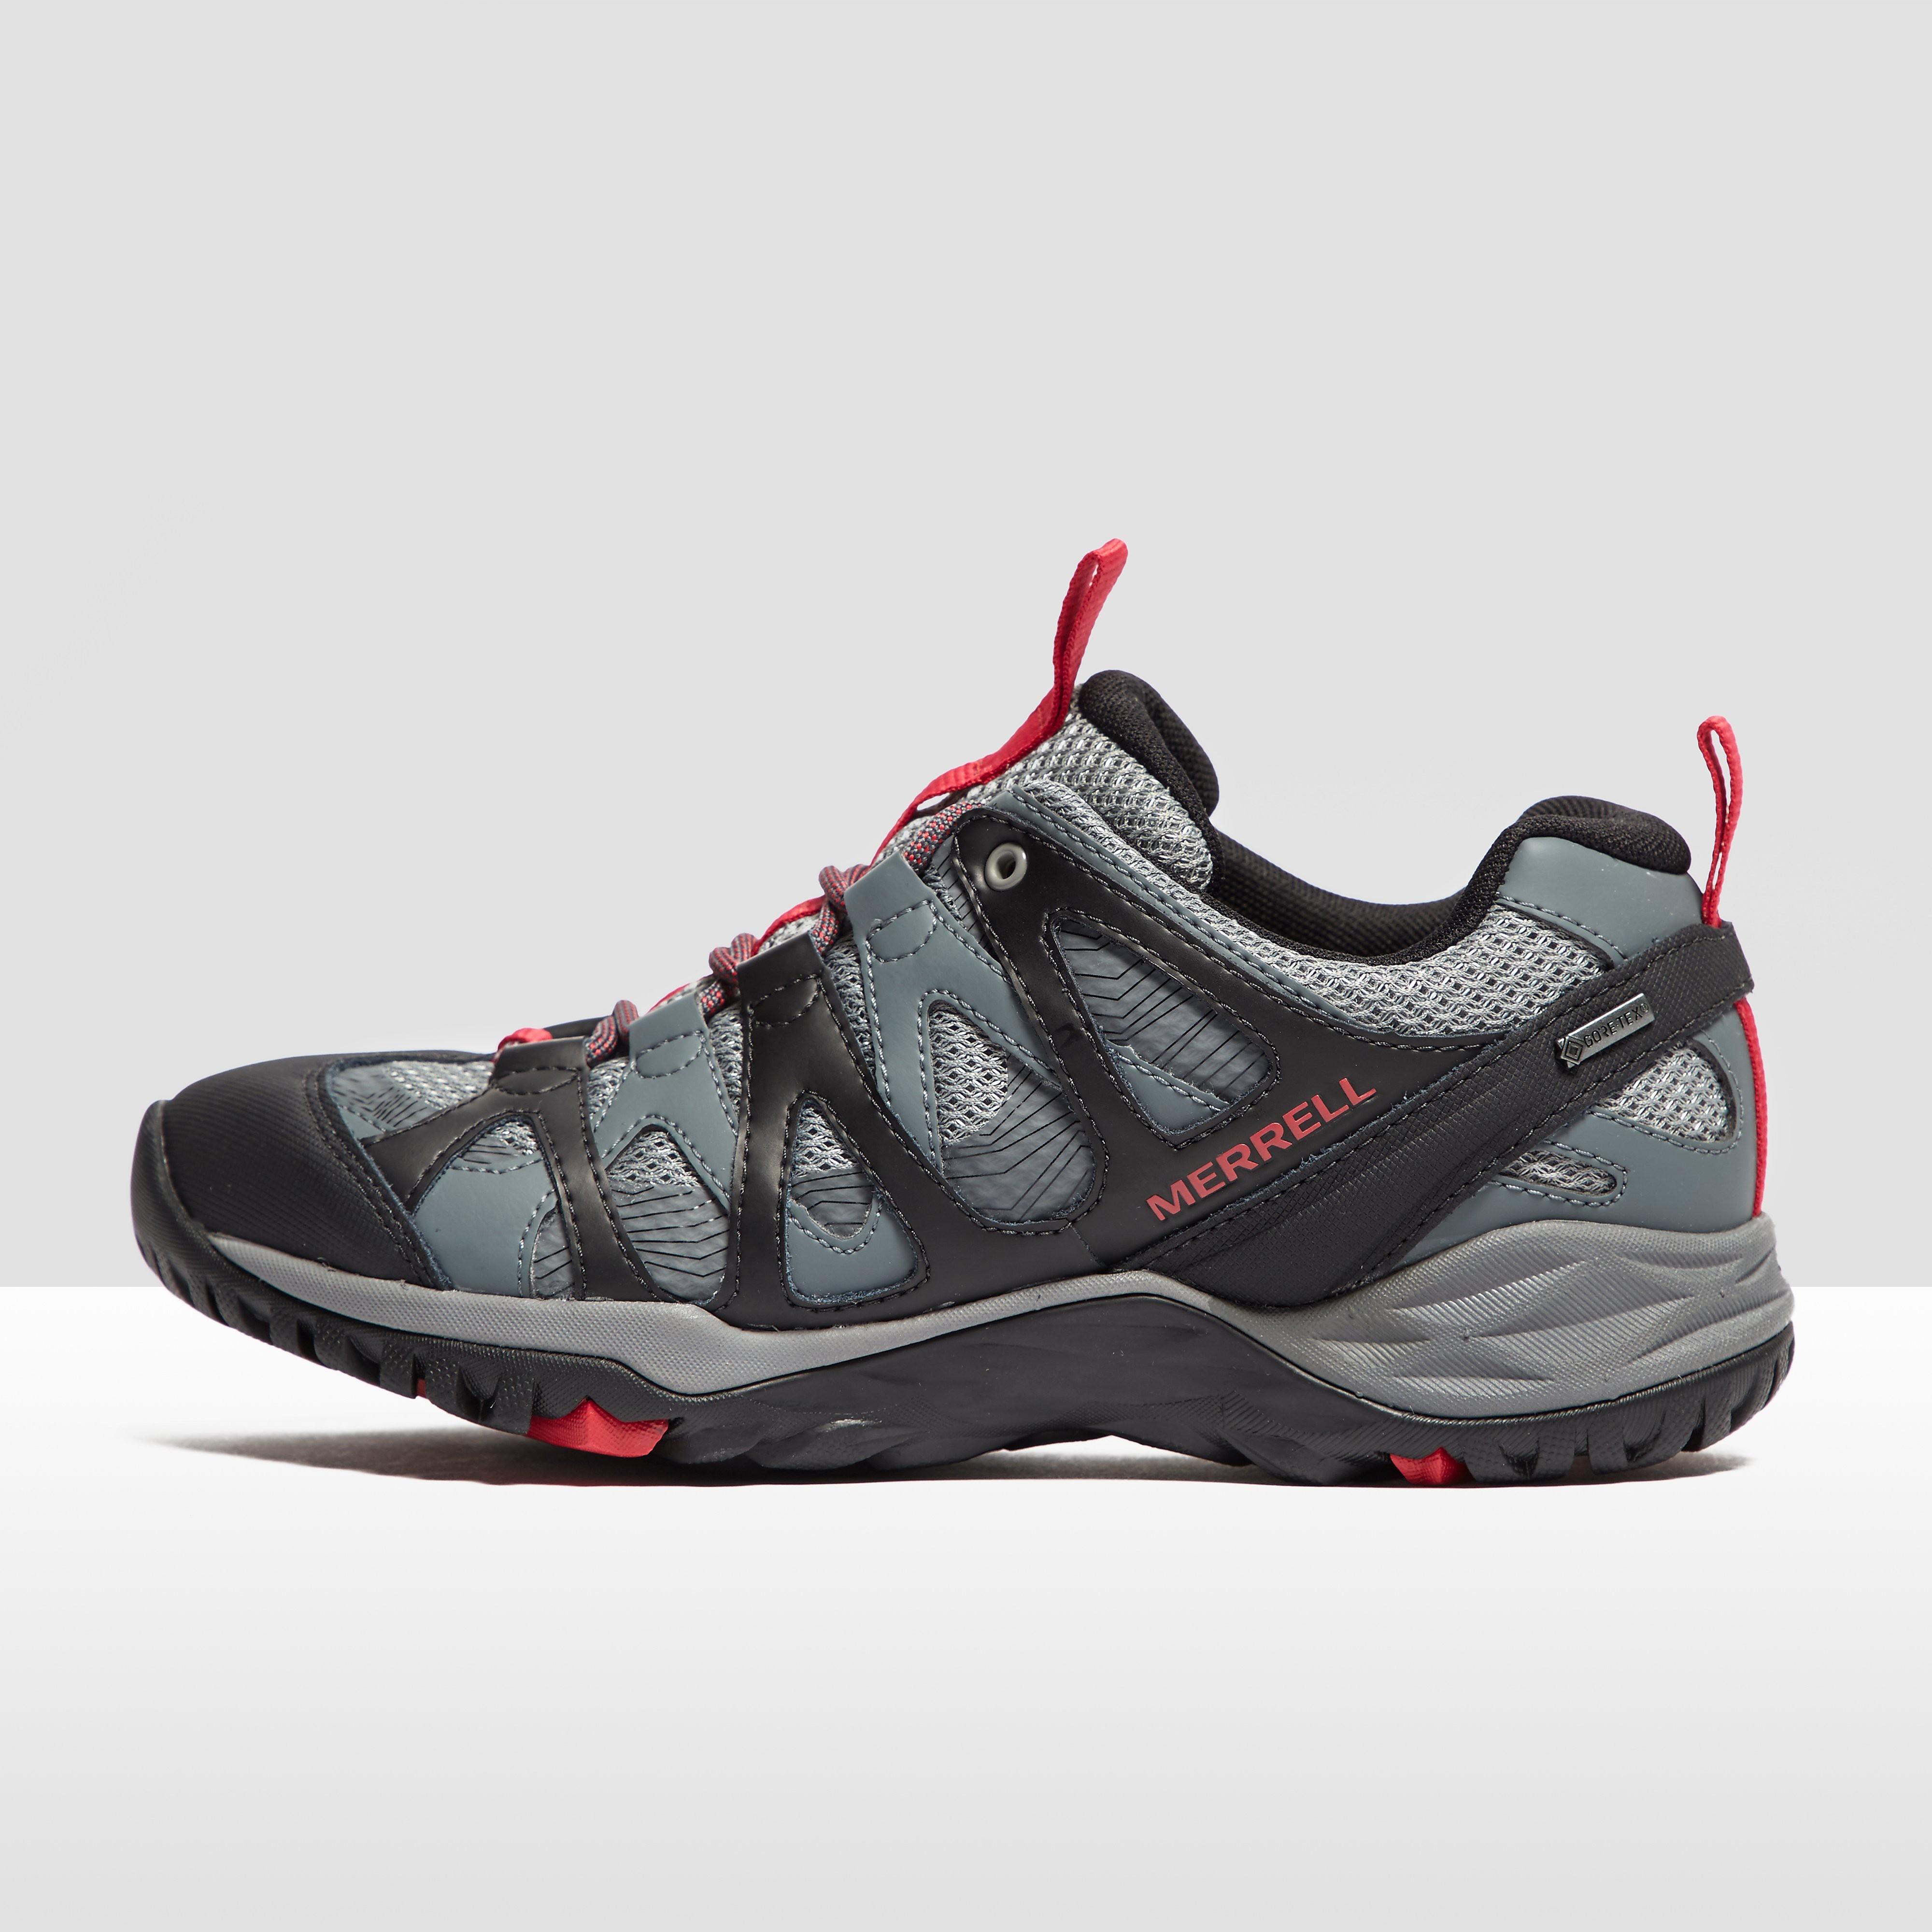 Merrell Siren Hex Q2 Gore-Tex Women's Hiking Shoes